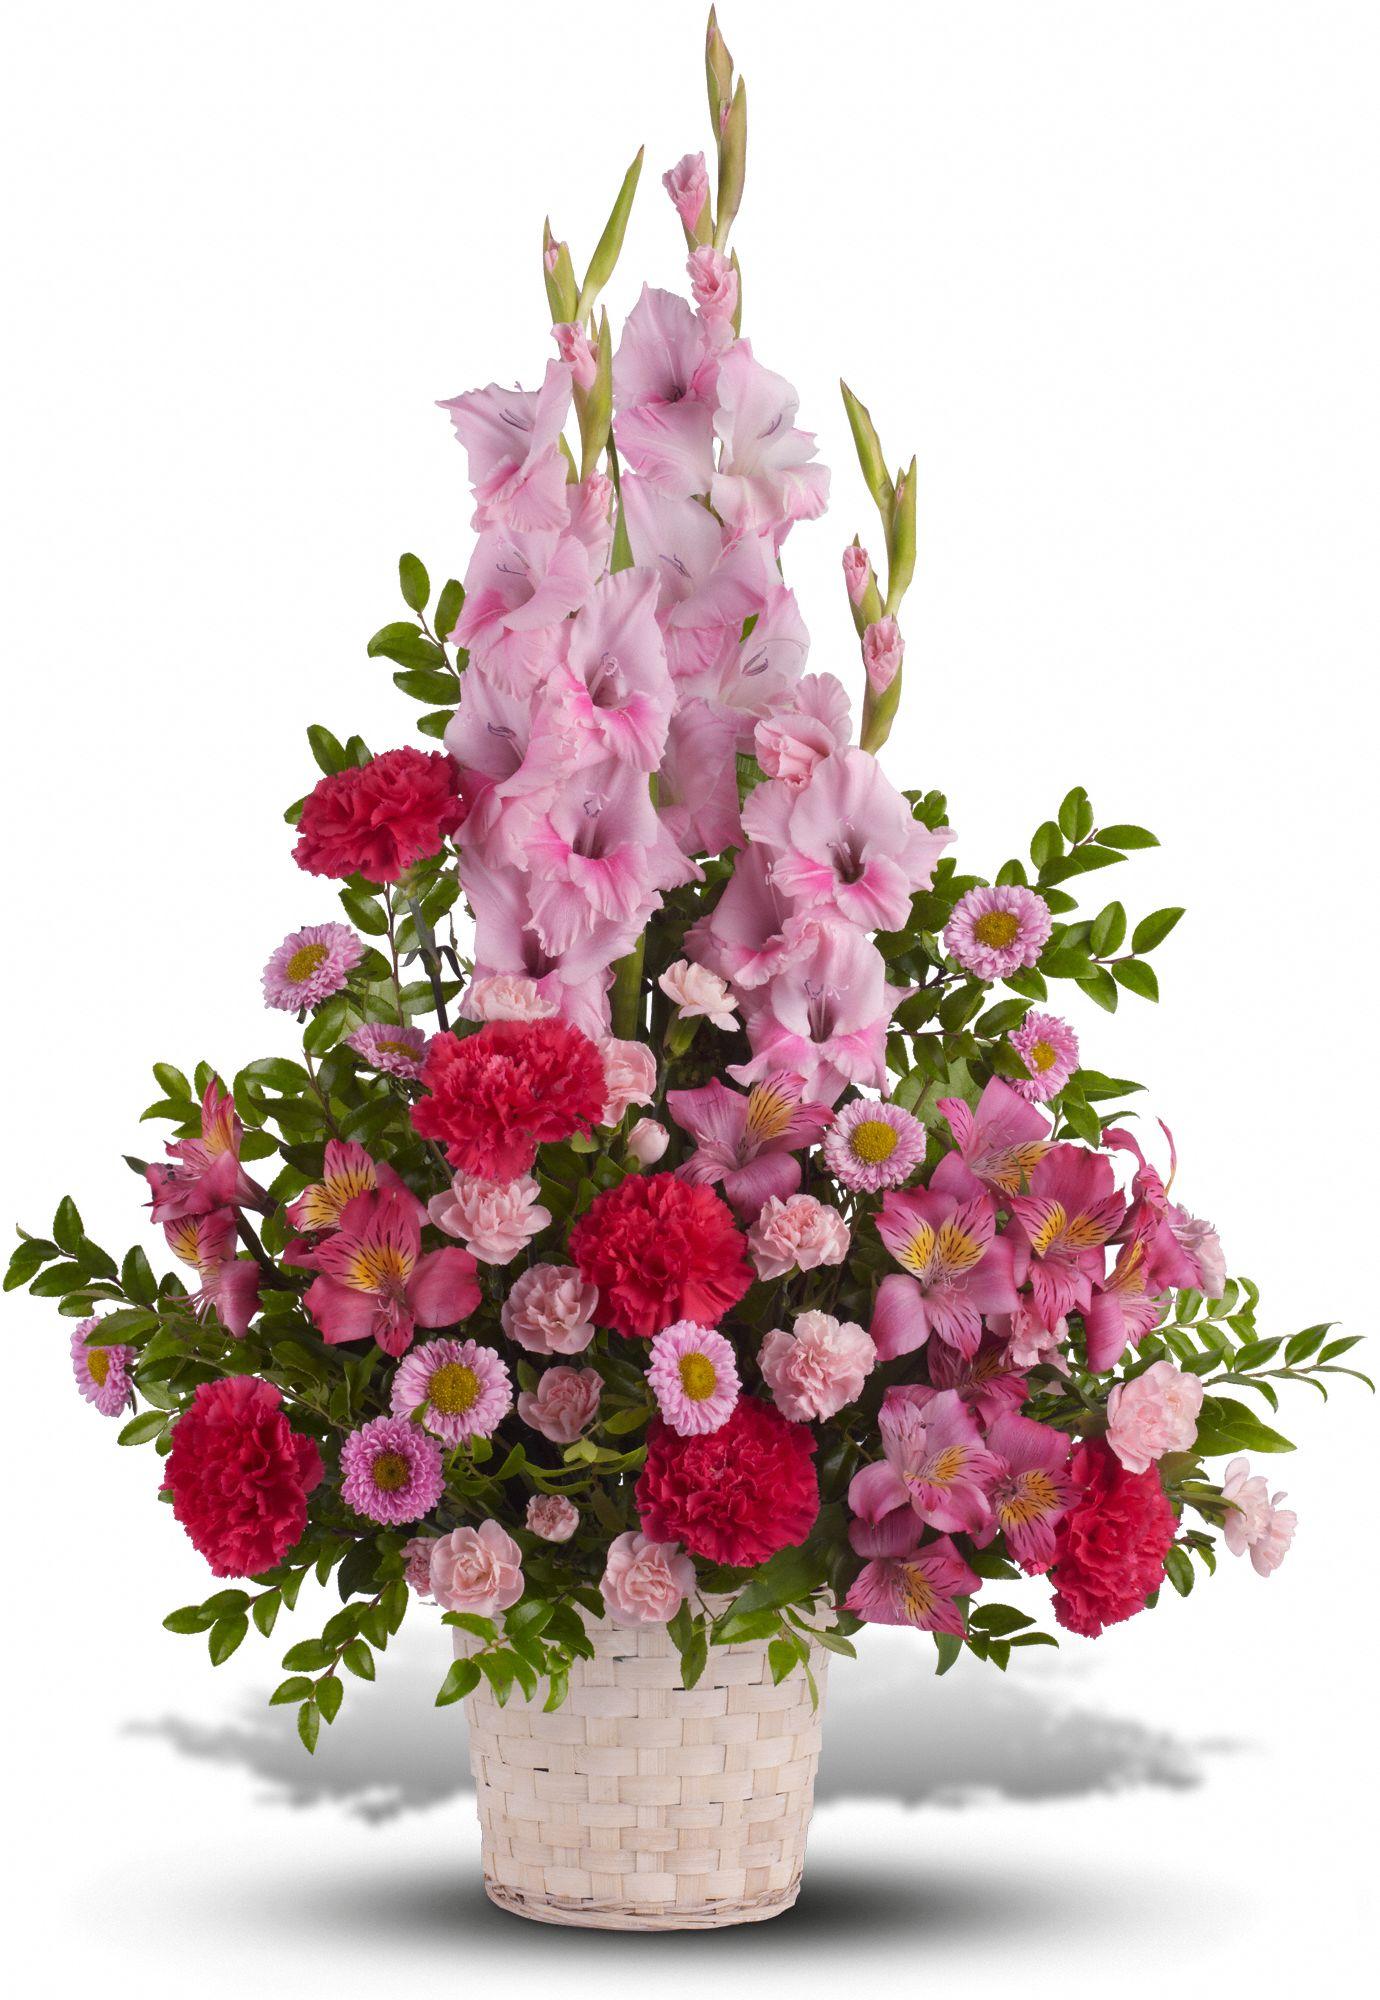 Etiquette FAQ for Choosing Flowers for a Funeral Teleflora